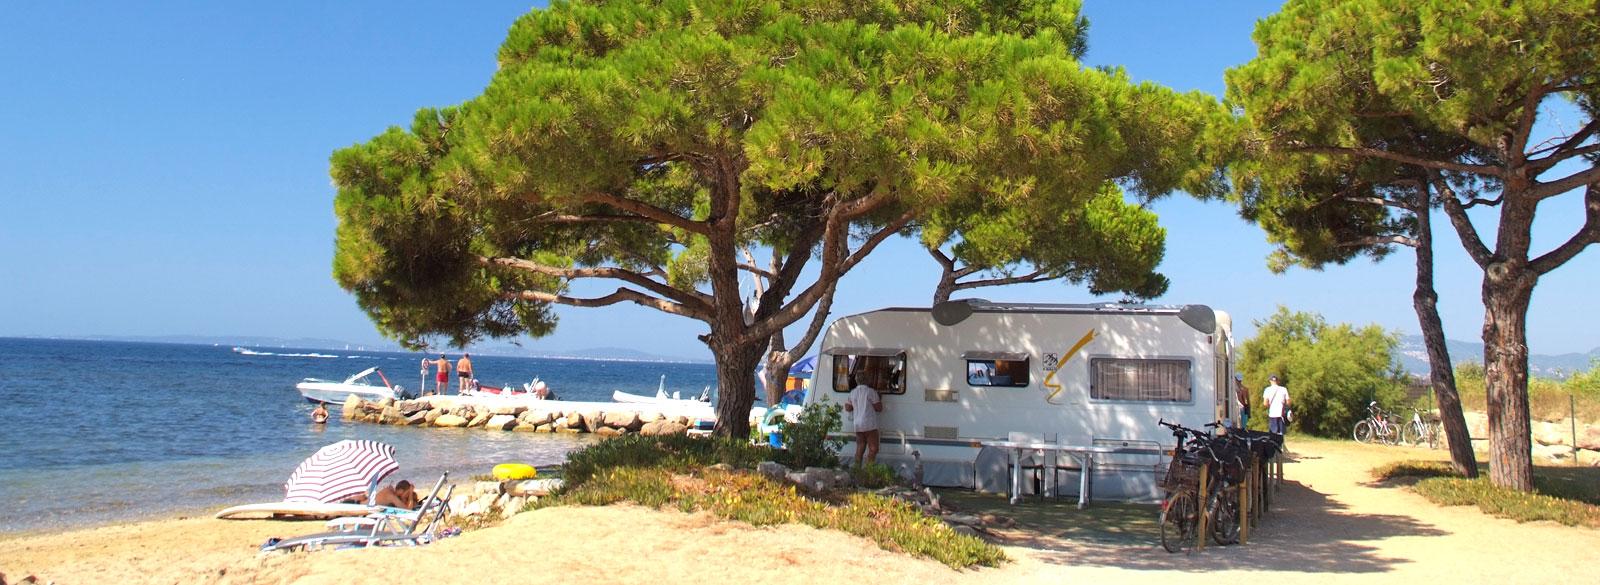 camping bormes les mimosas - Vue aerienne du camping